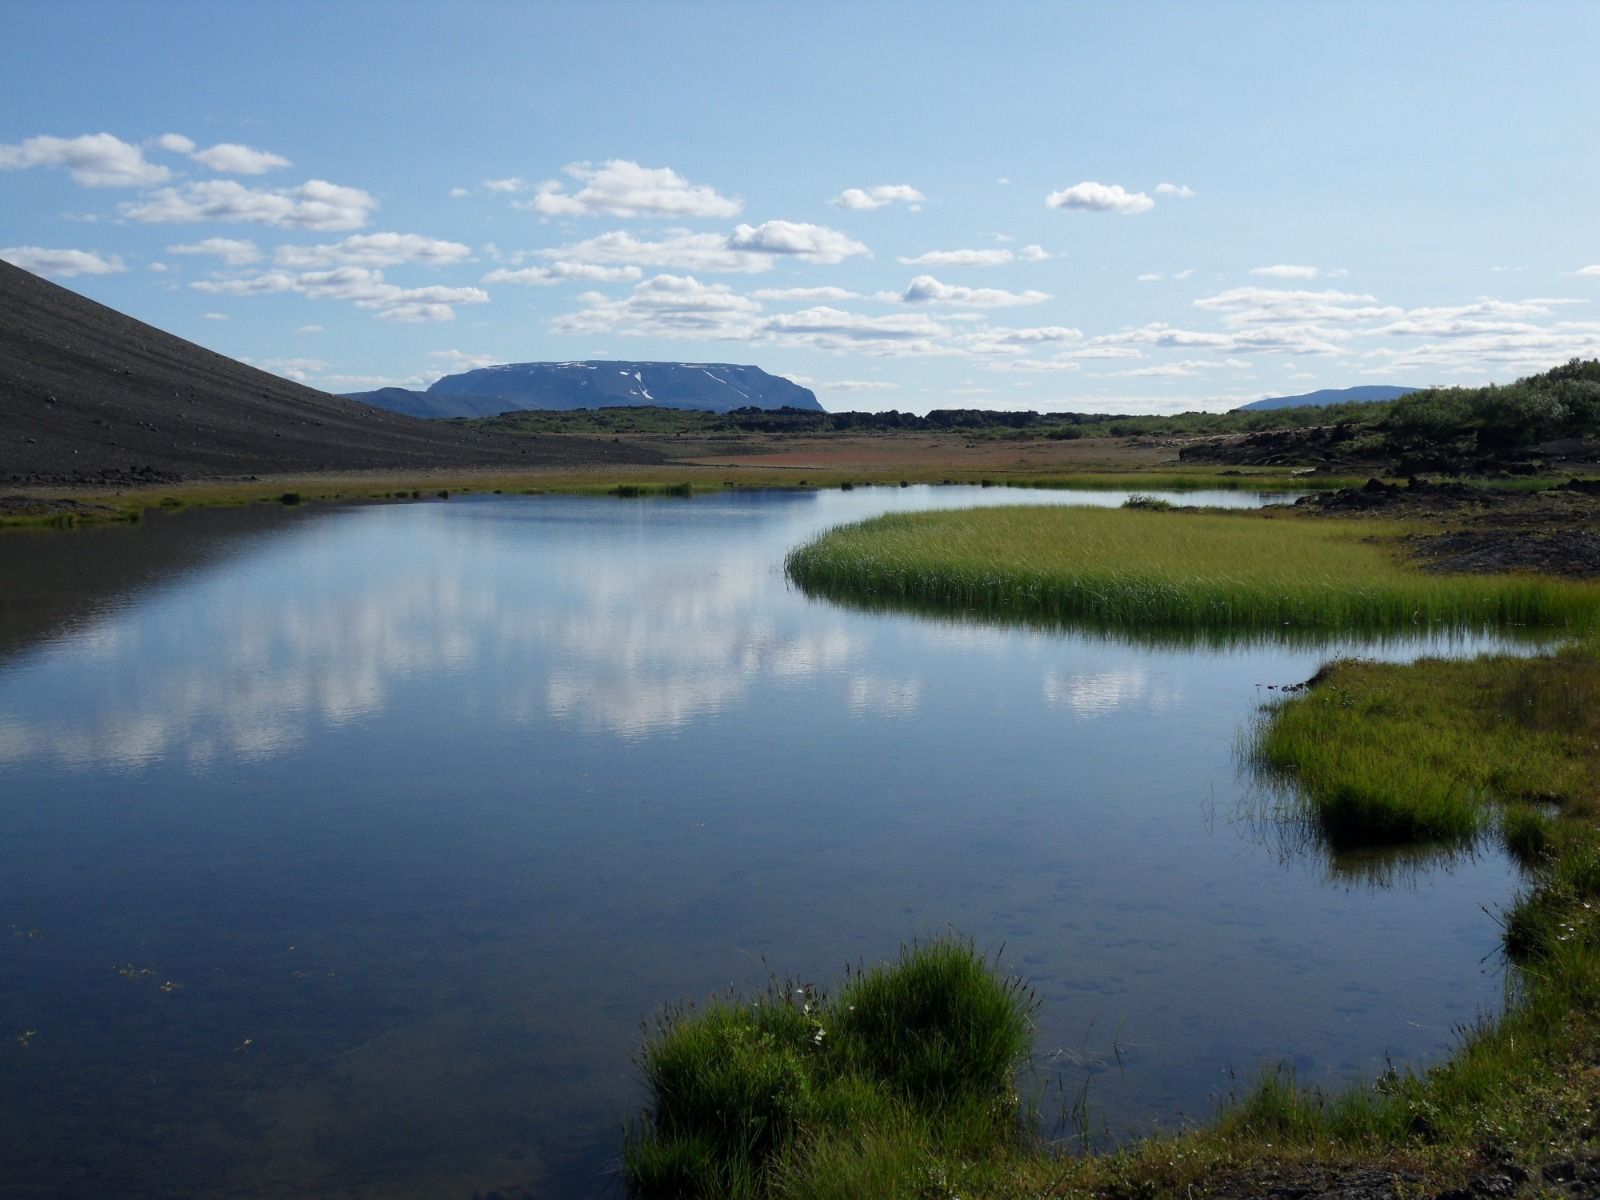 islanda11-1614868774.jpg